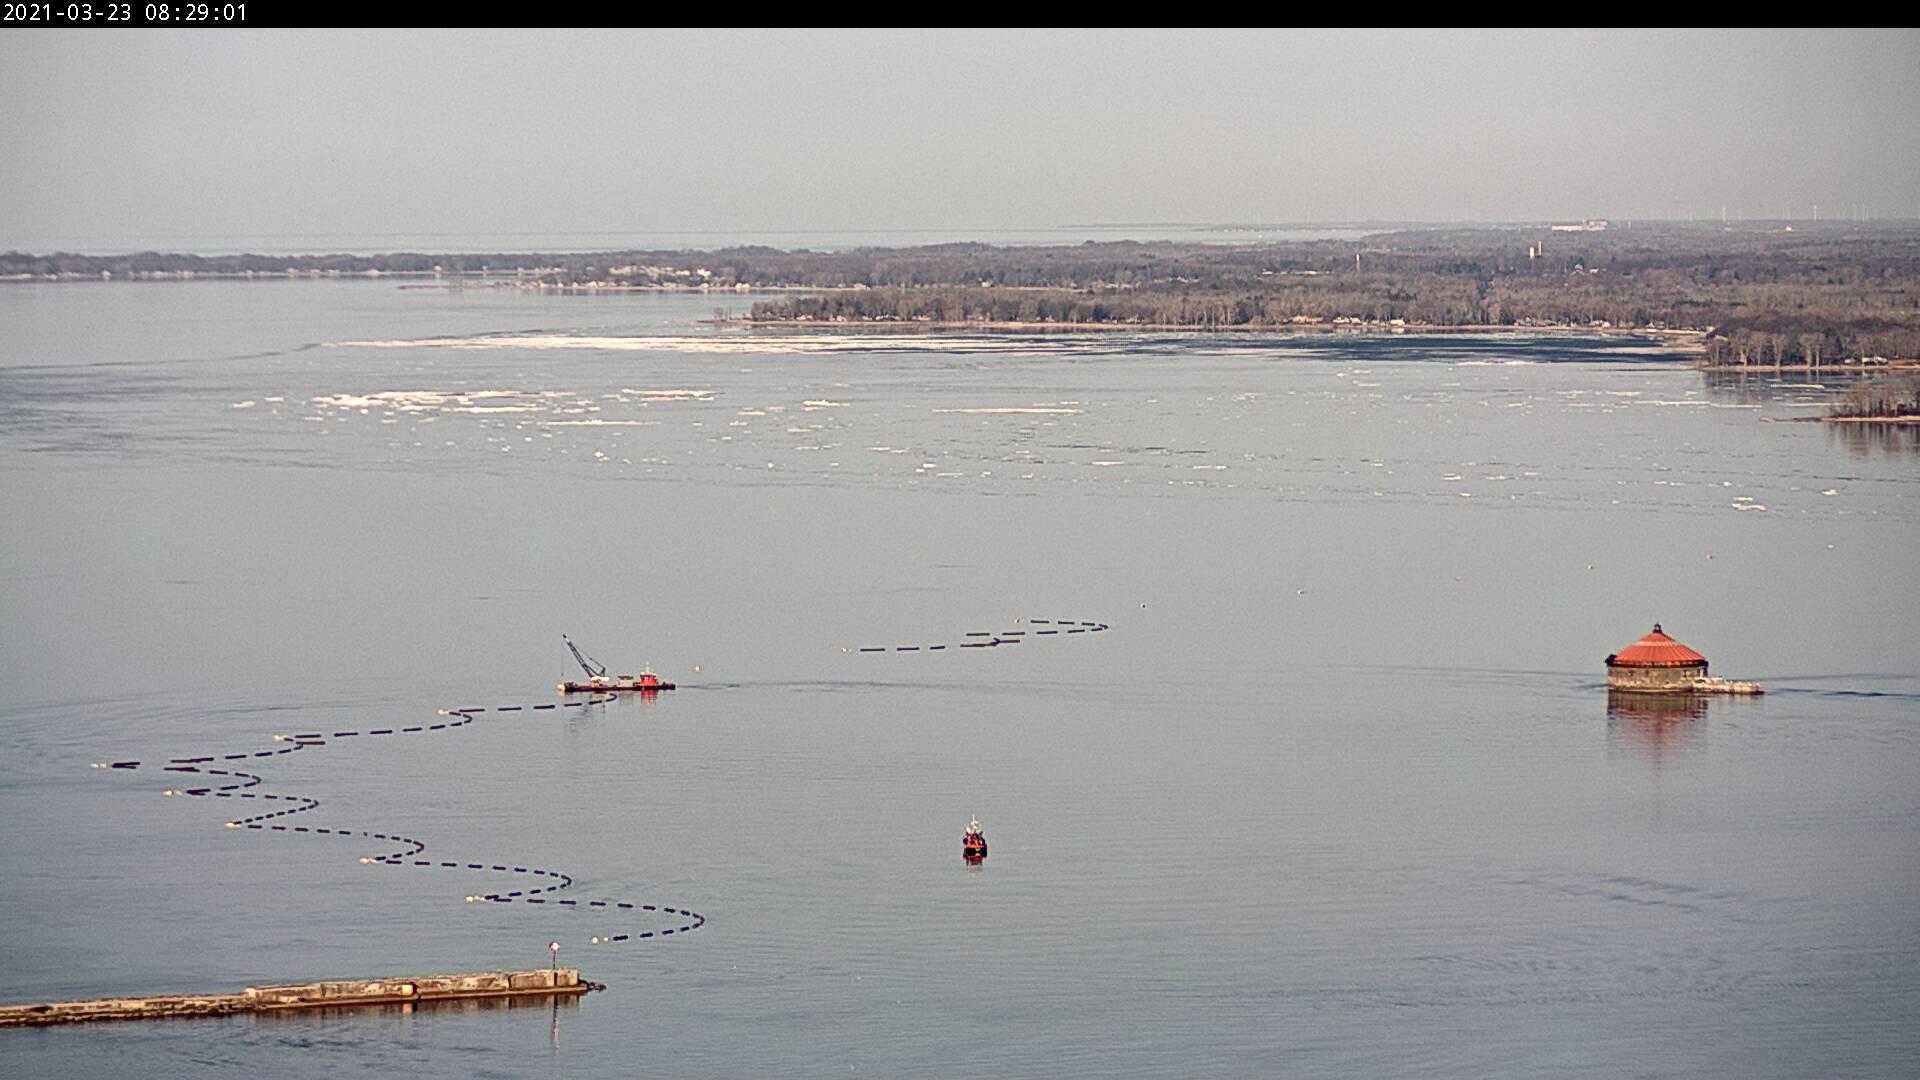 Lake Erie - Niagara River Ice Boom Removal March 23, 2021